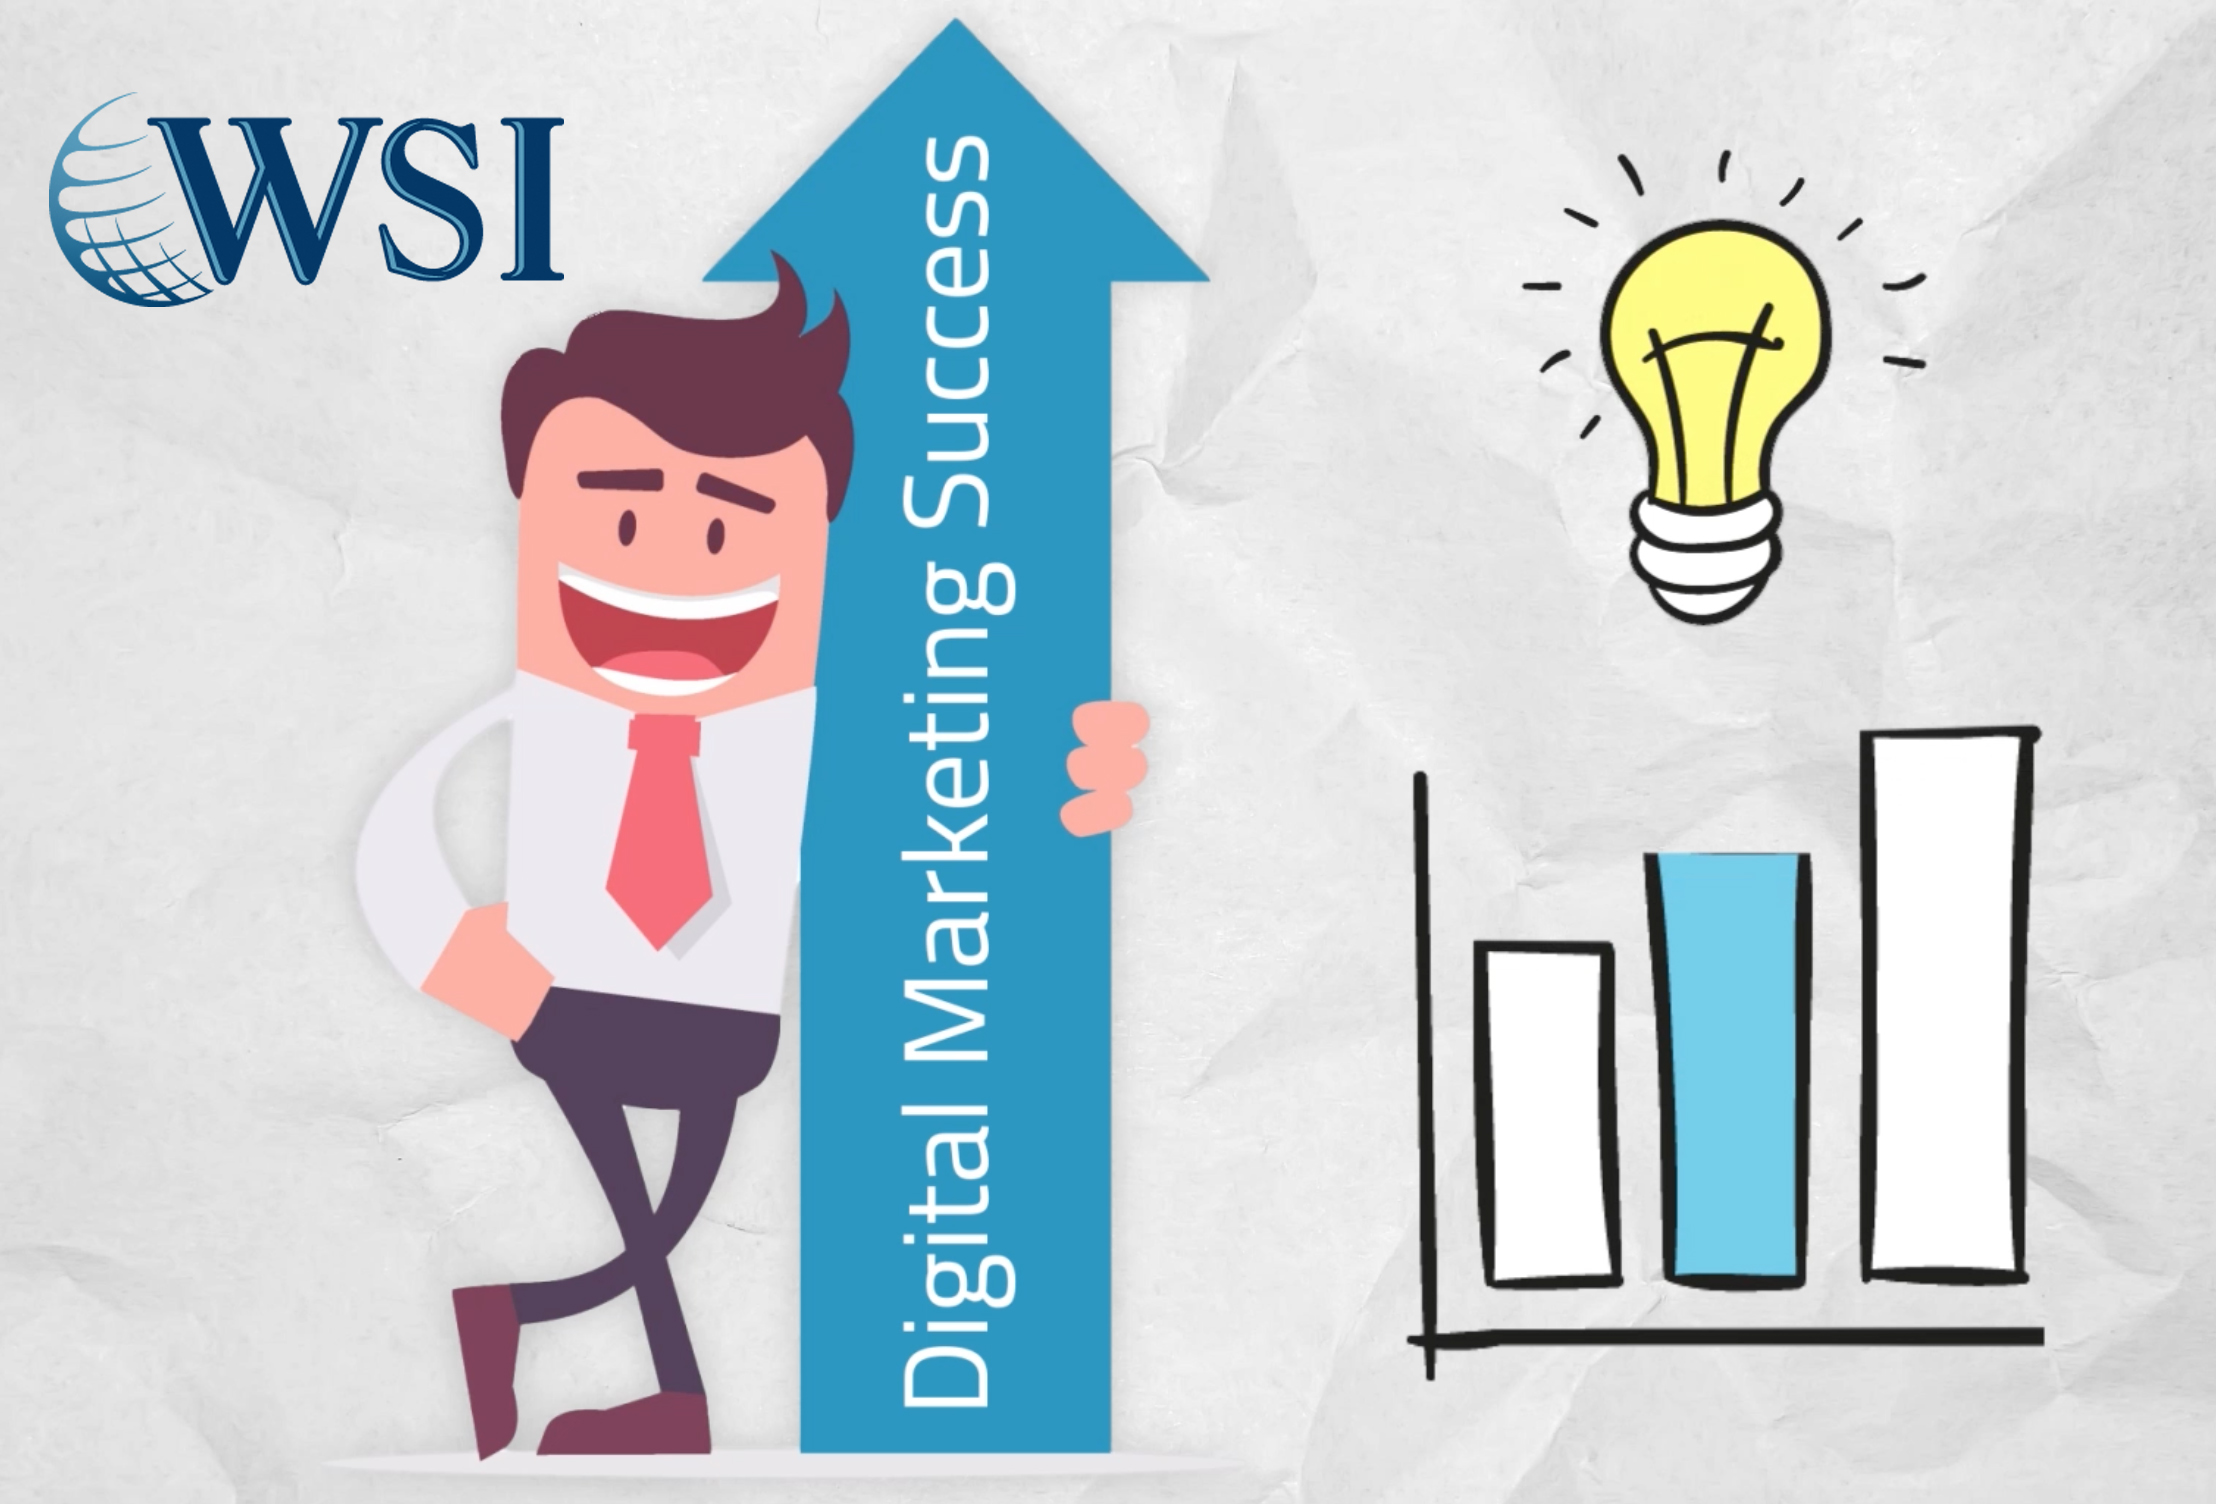 6 Essentials for a Successful Digital Marketing Strategy